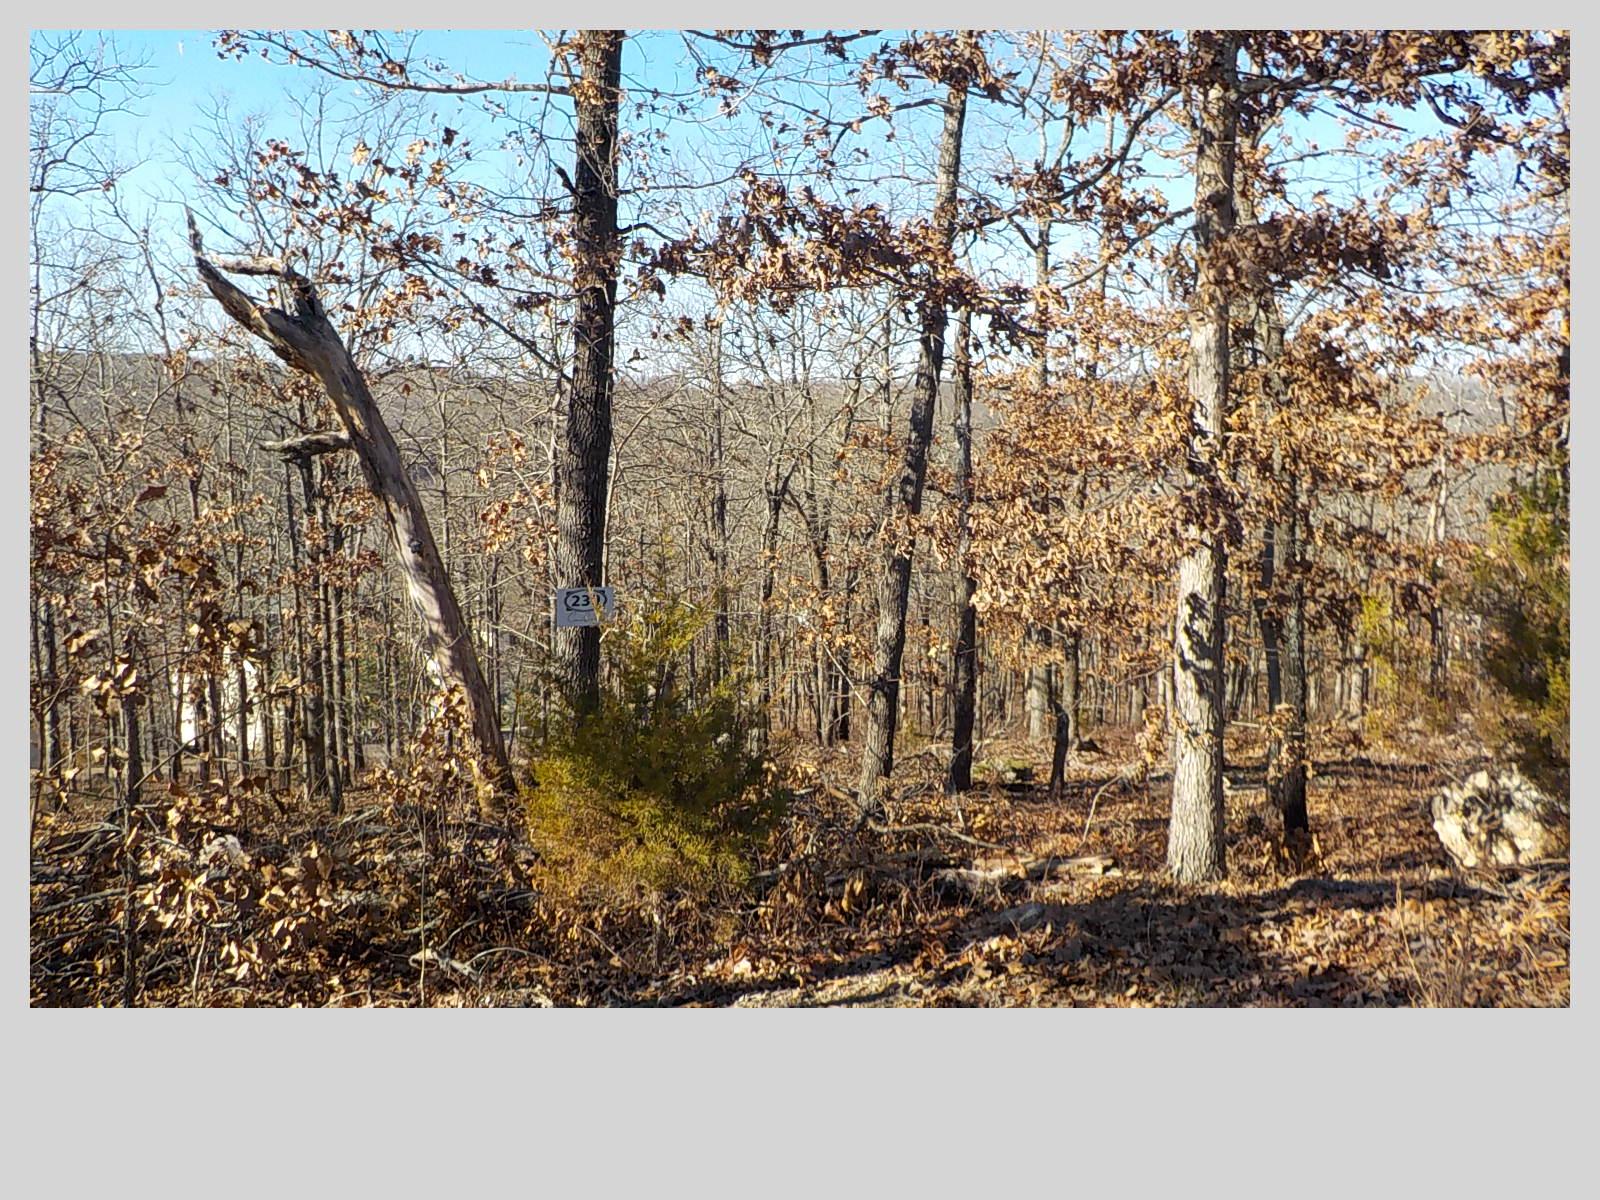 239 N. Boulder Creek Ct., Camdenton, Missouri 65020